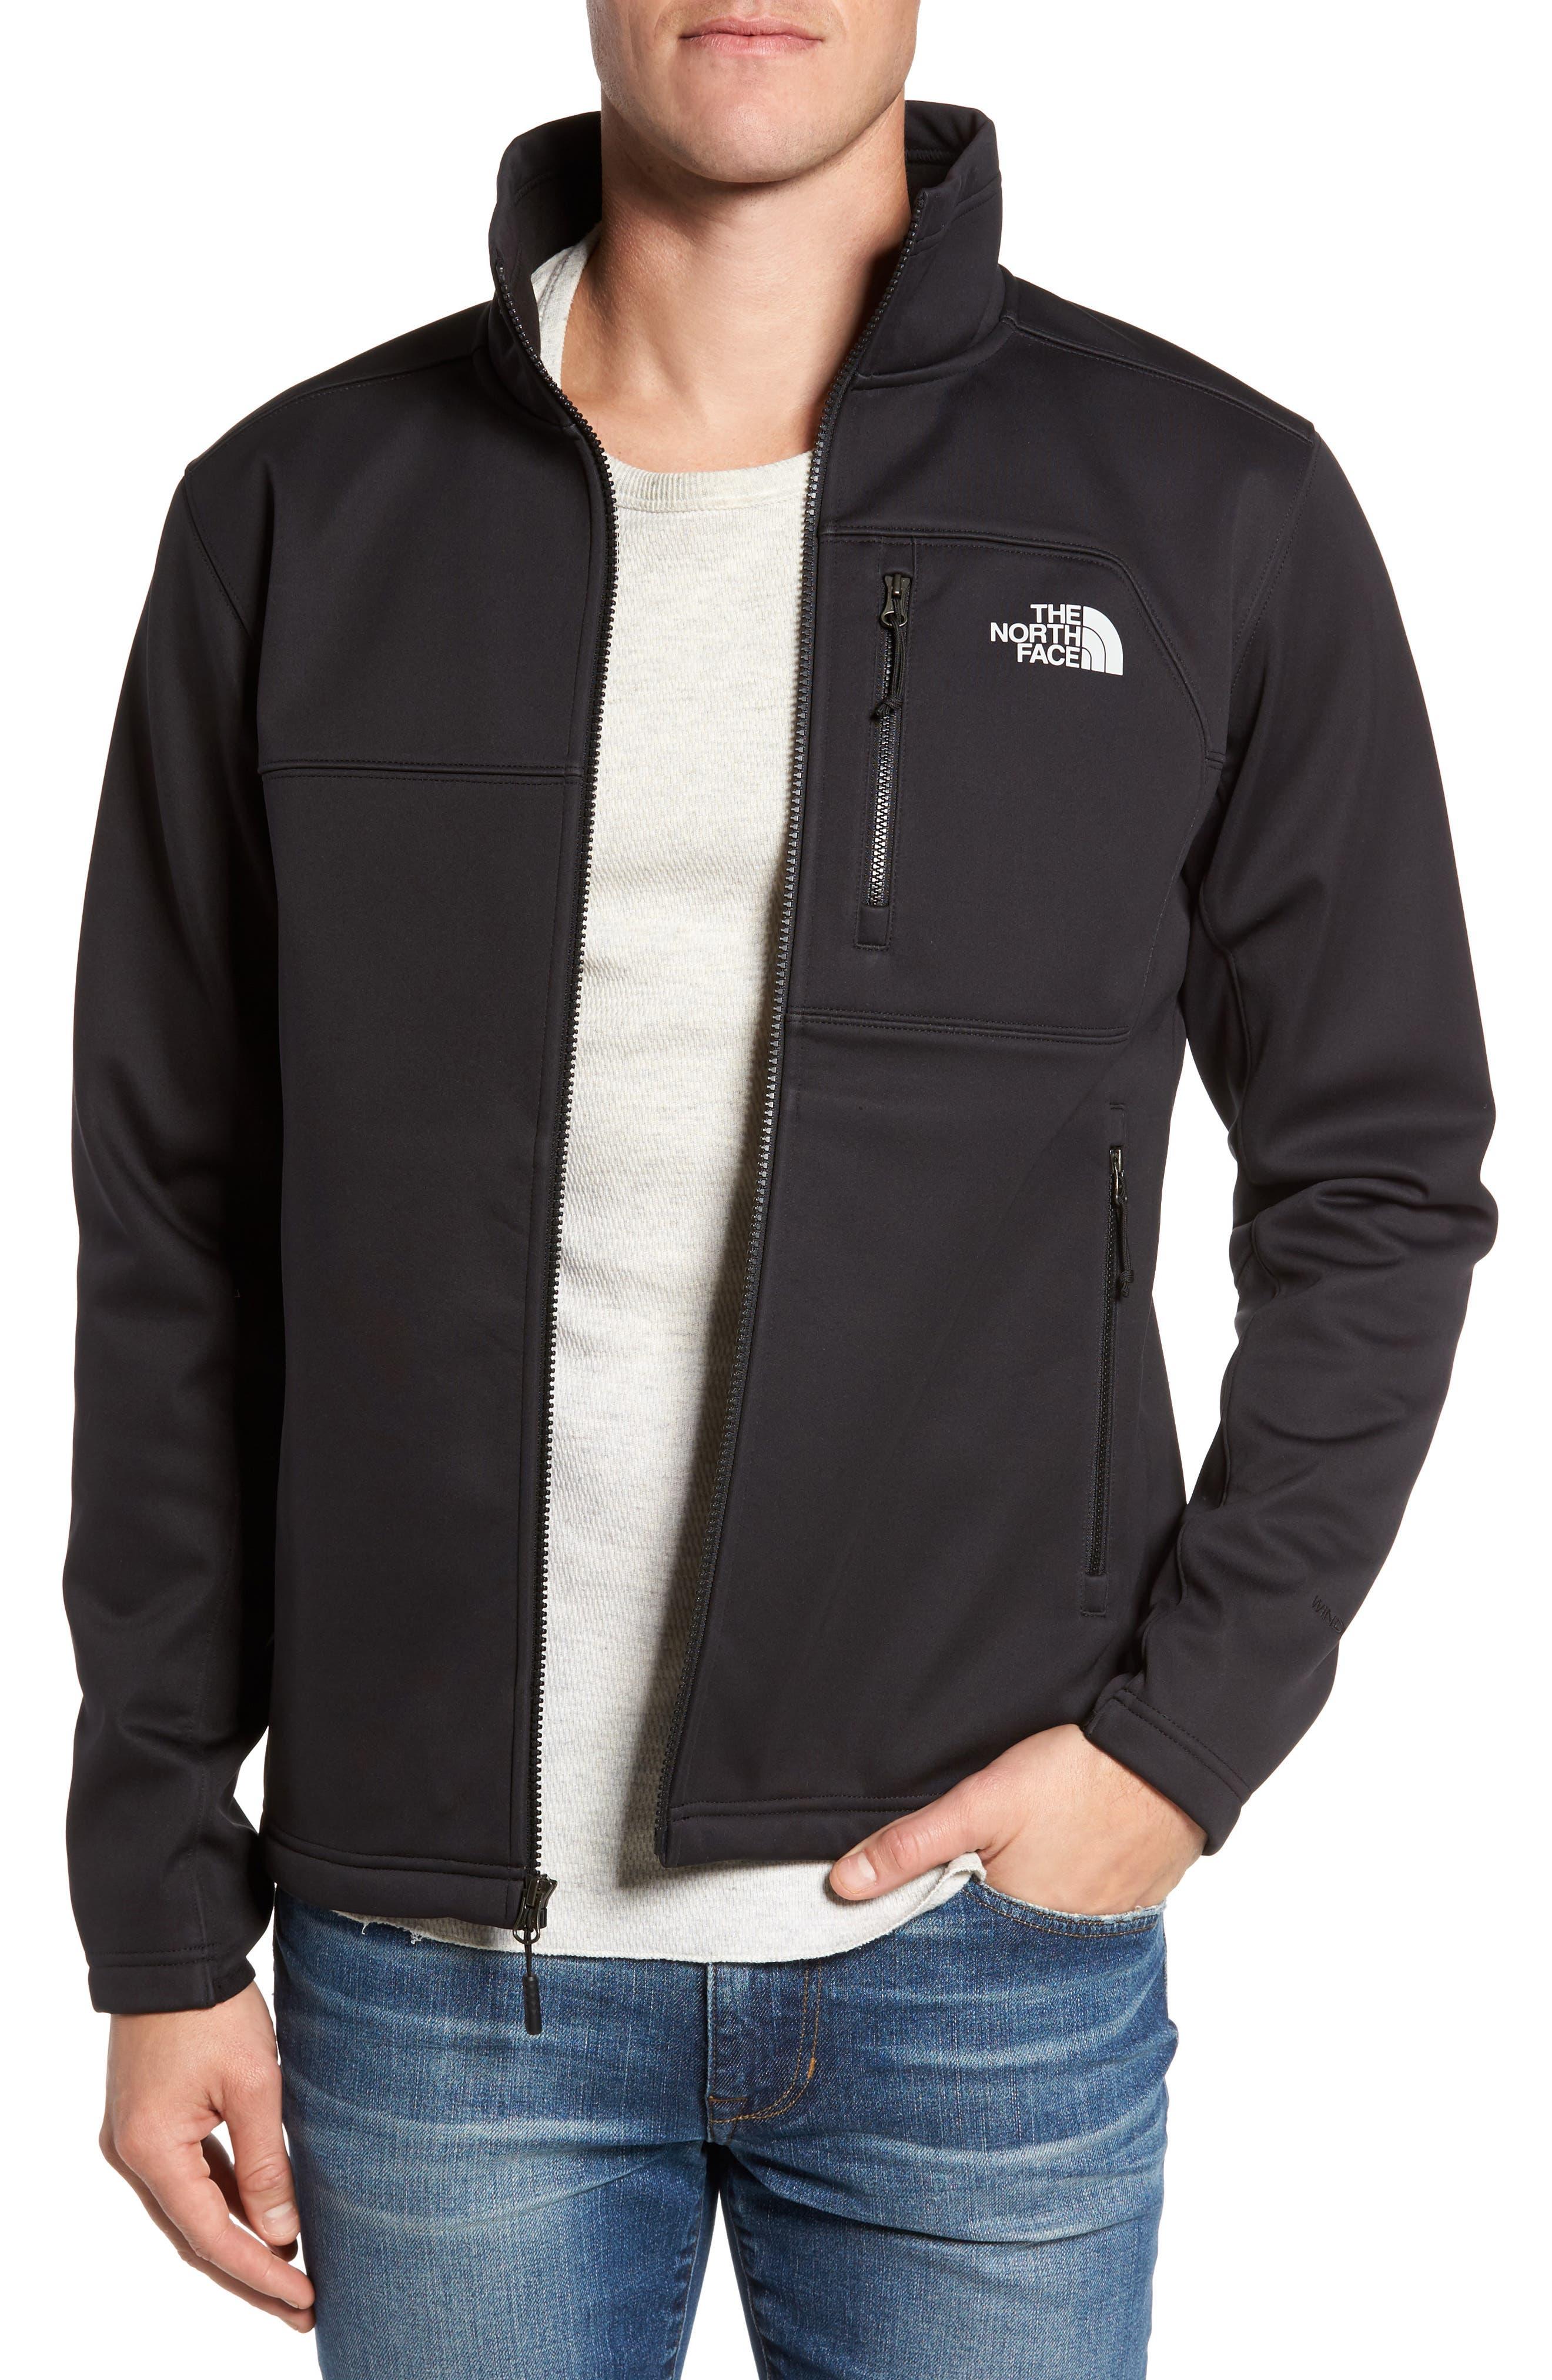 Apex Risor Jacket,                         Main,                         color, Black/ Black